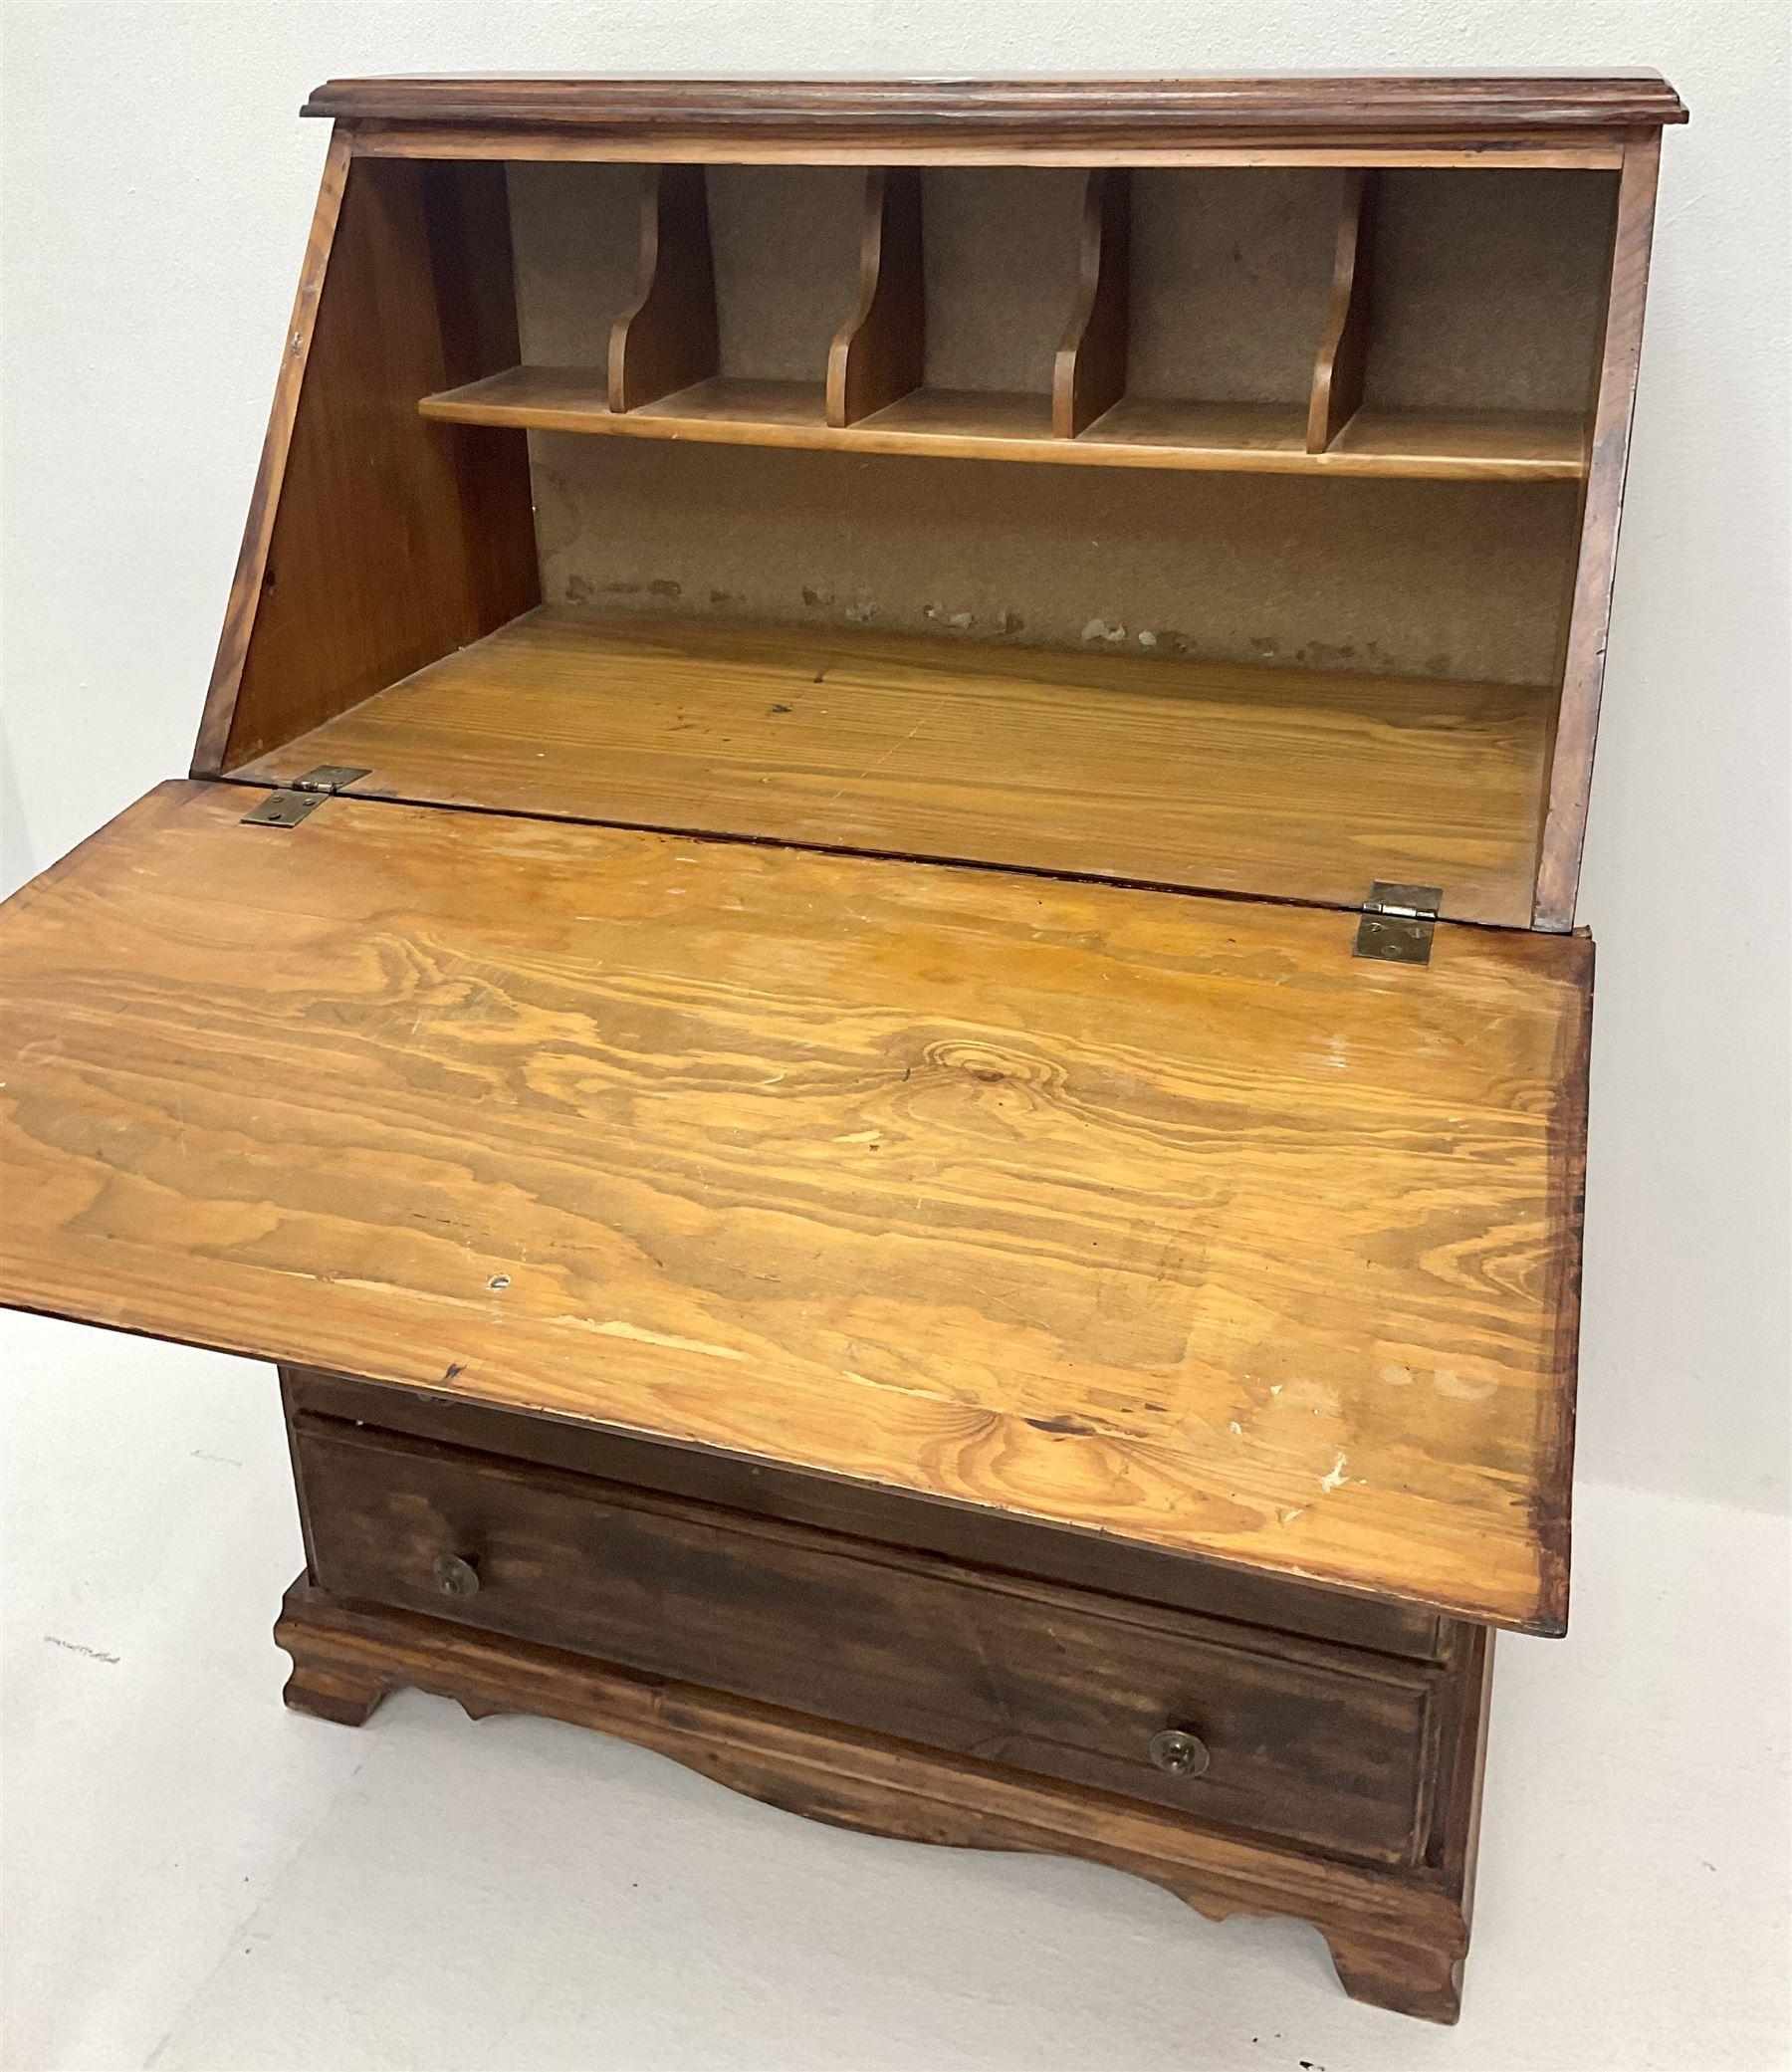 Hardwood bureau desk - Image 3 of 3